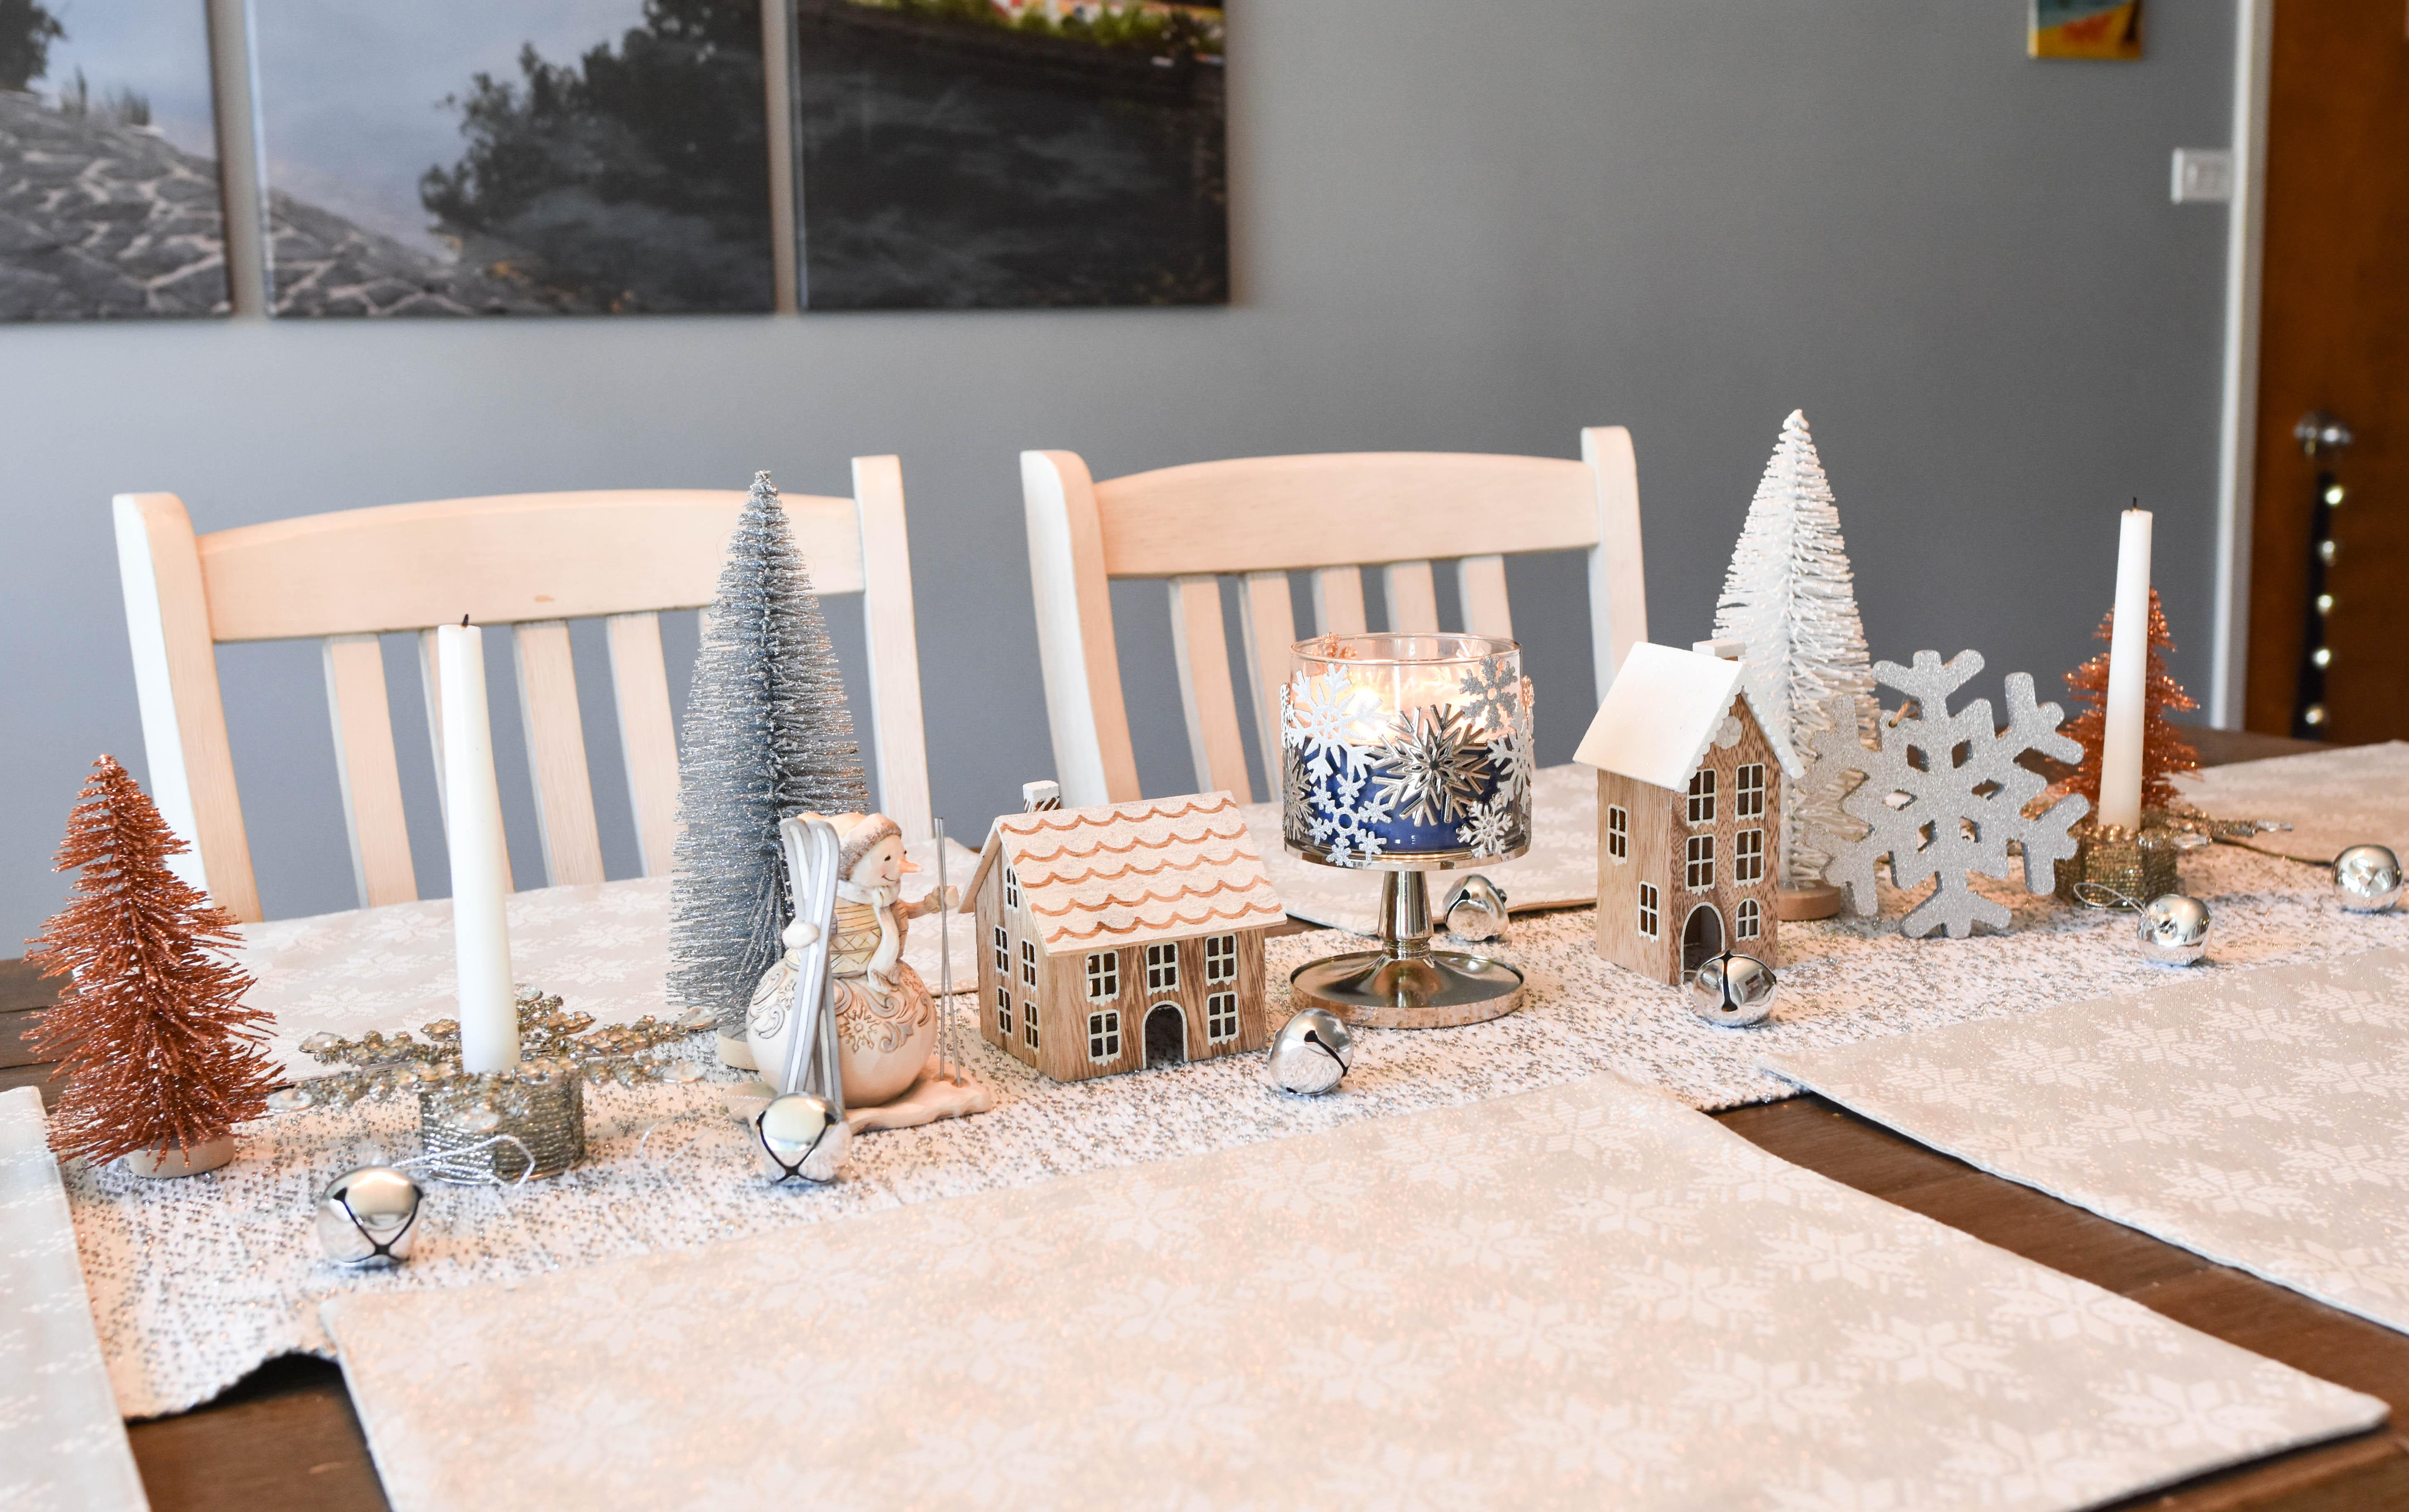 Affordable Winter Wonderland Holiday Tablescape Floradise